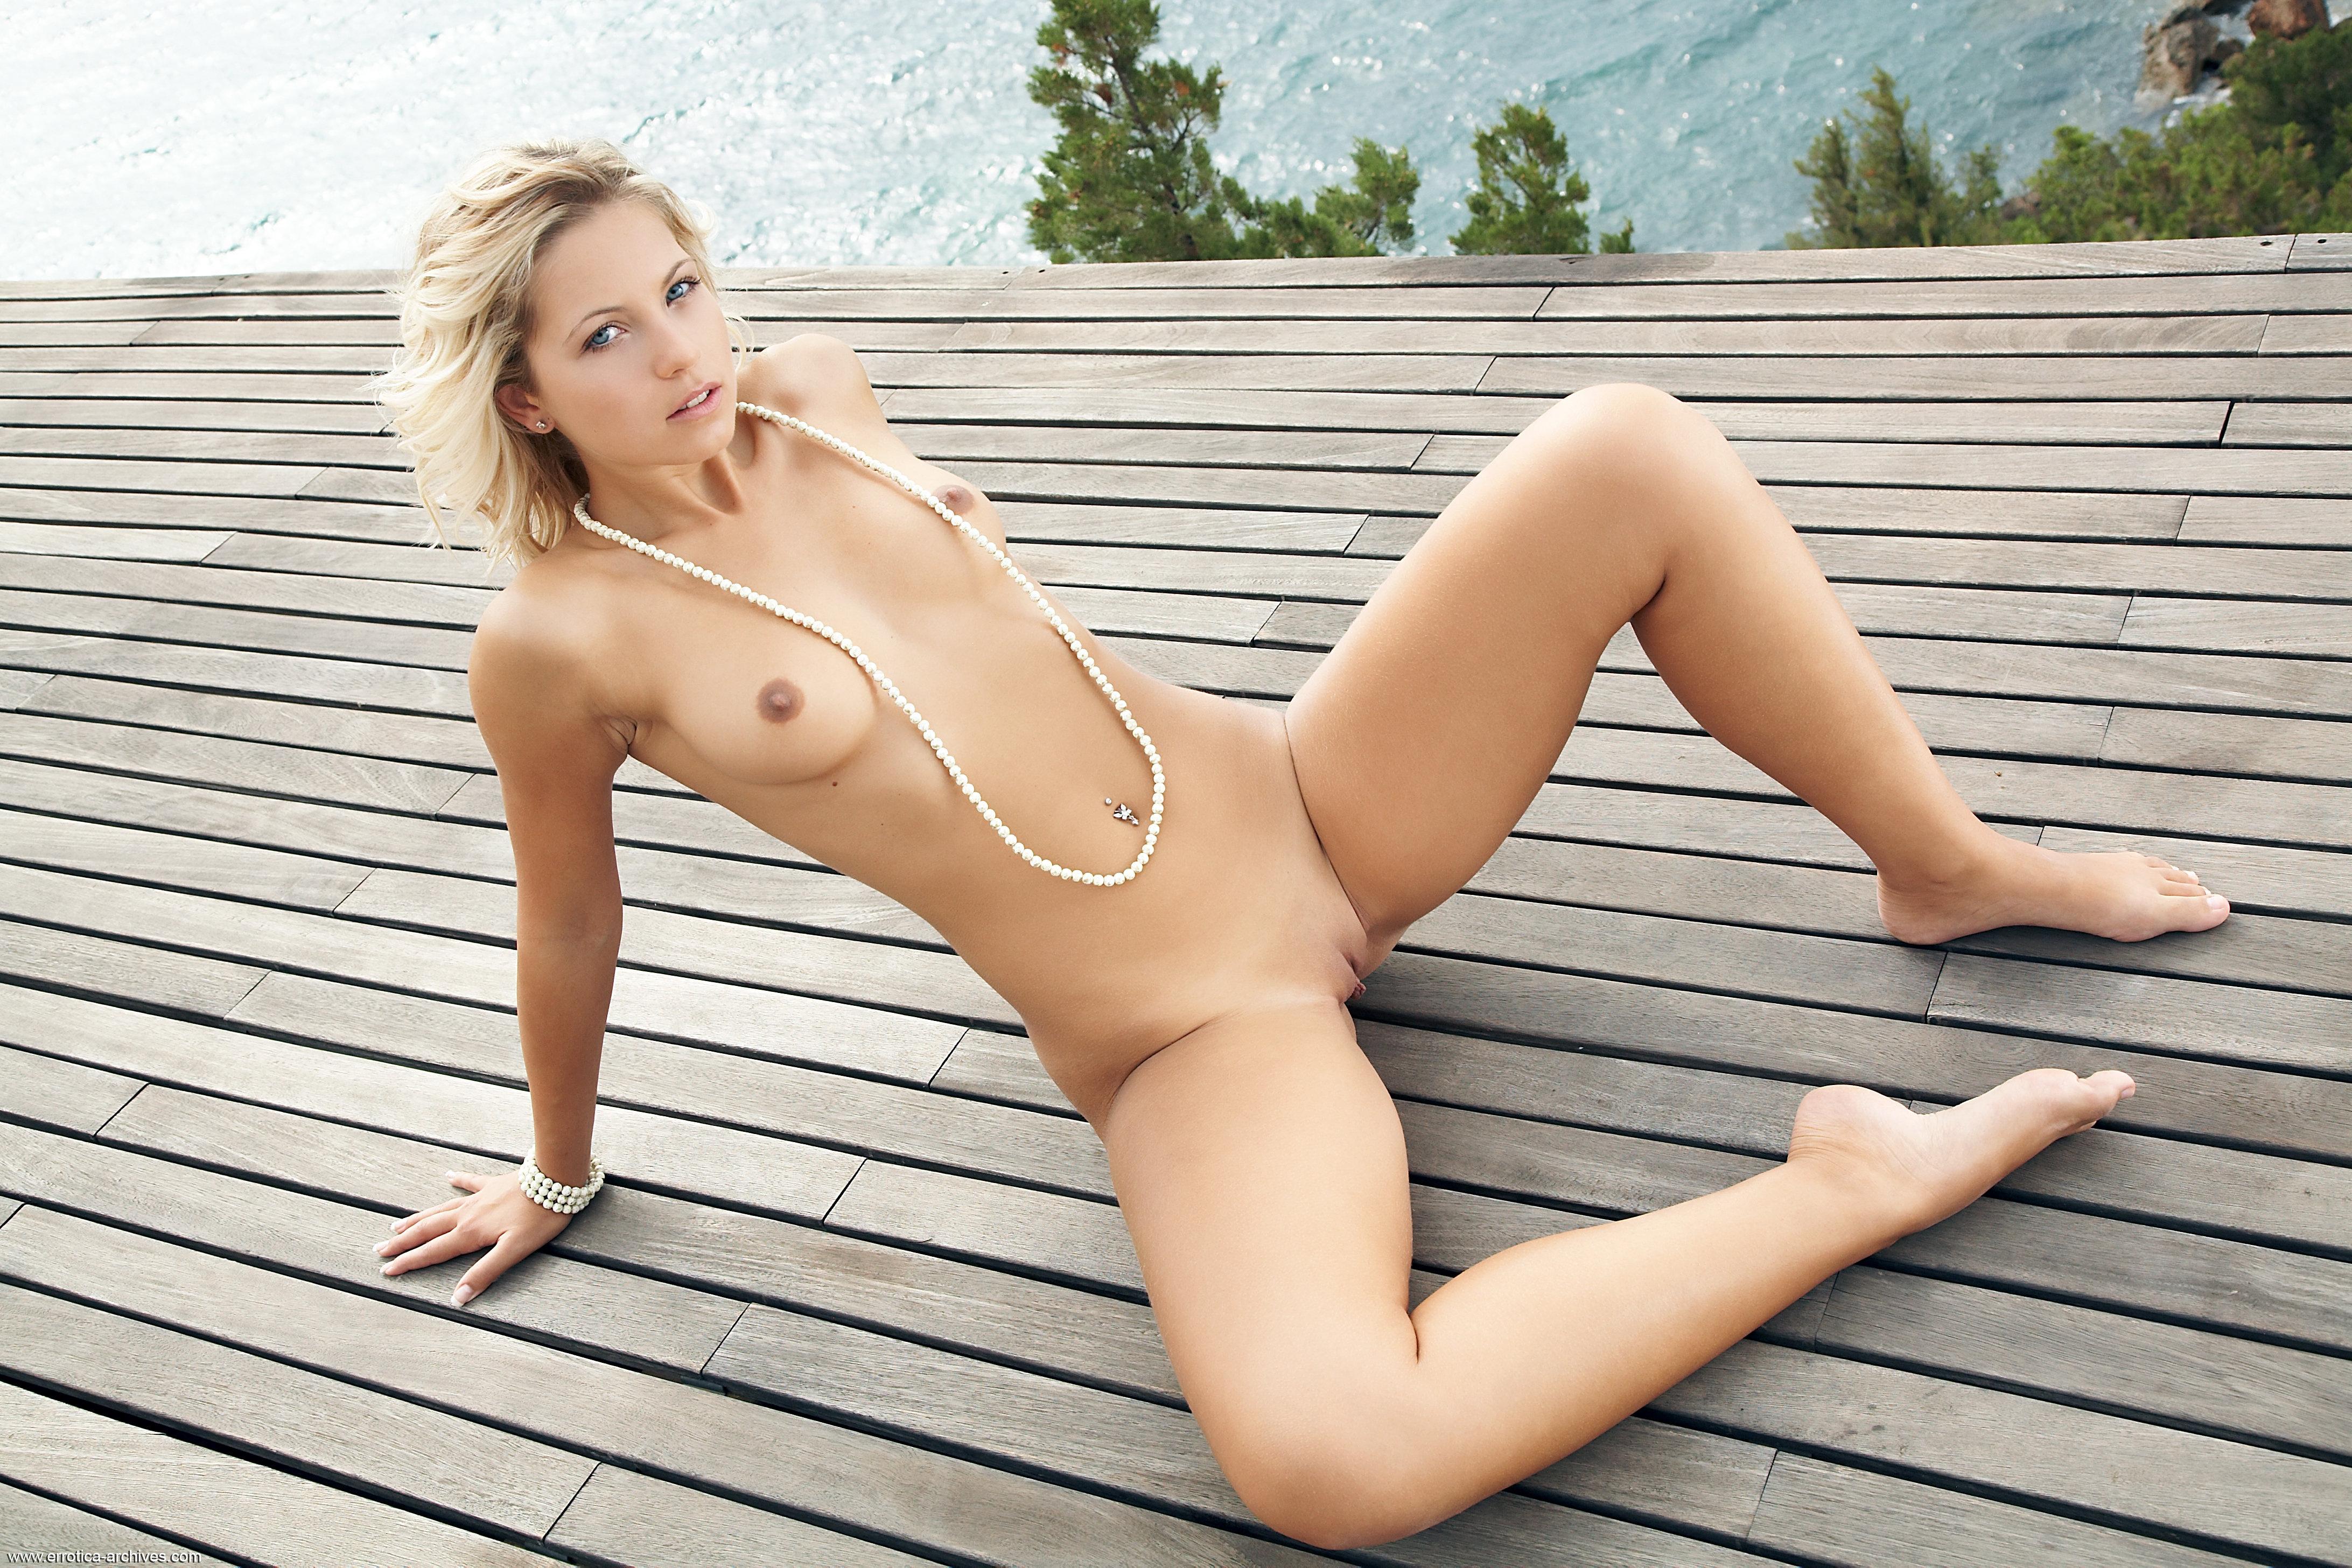 Jenni kohoutova having sex really